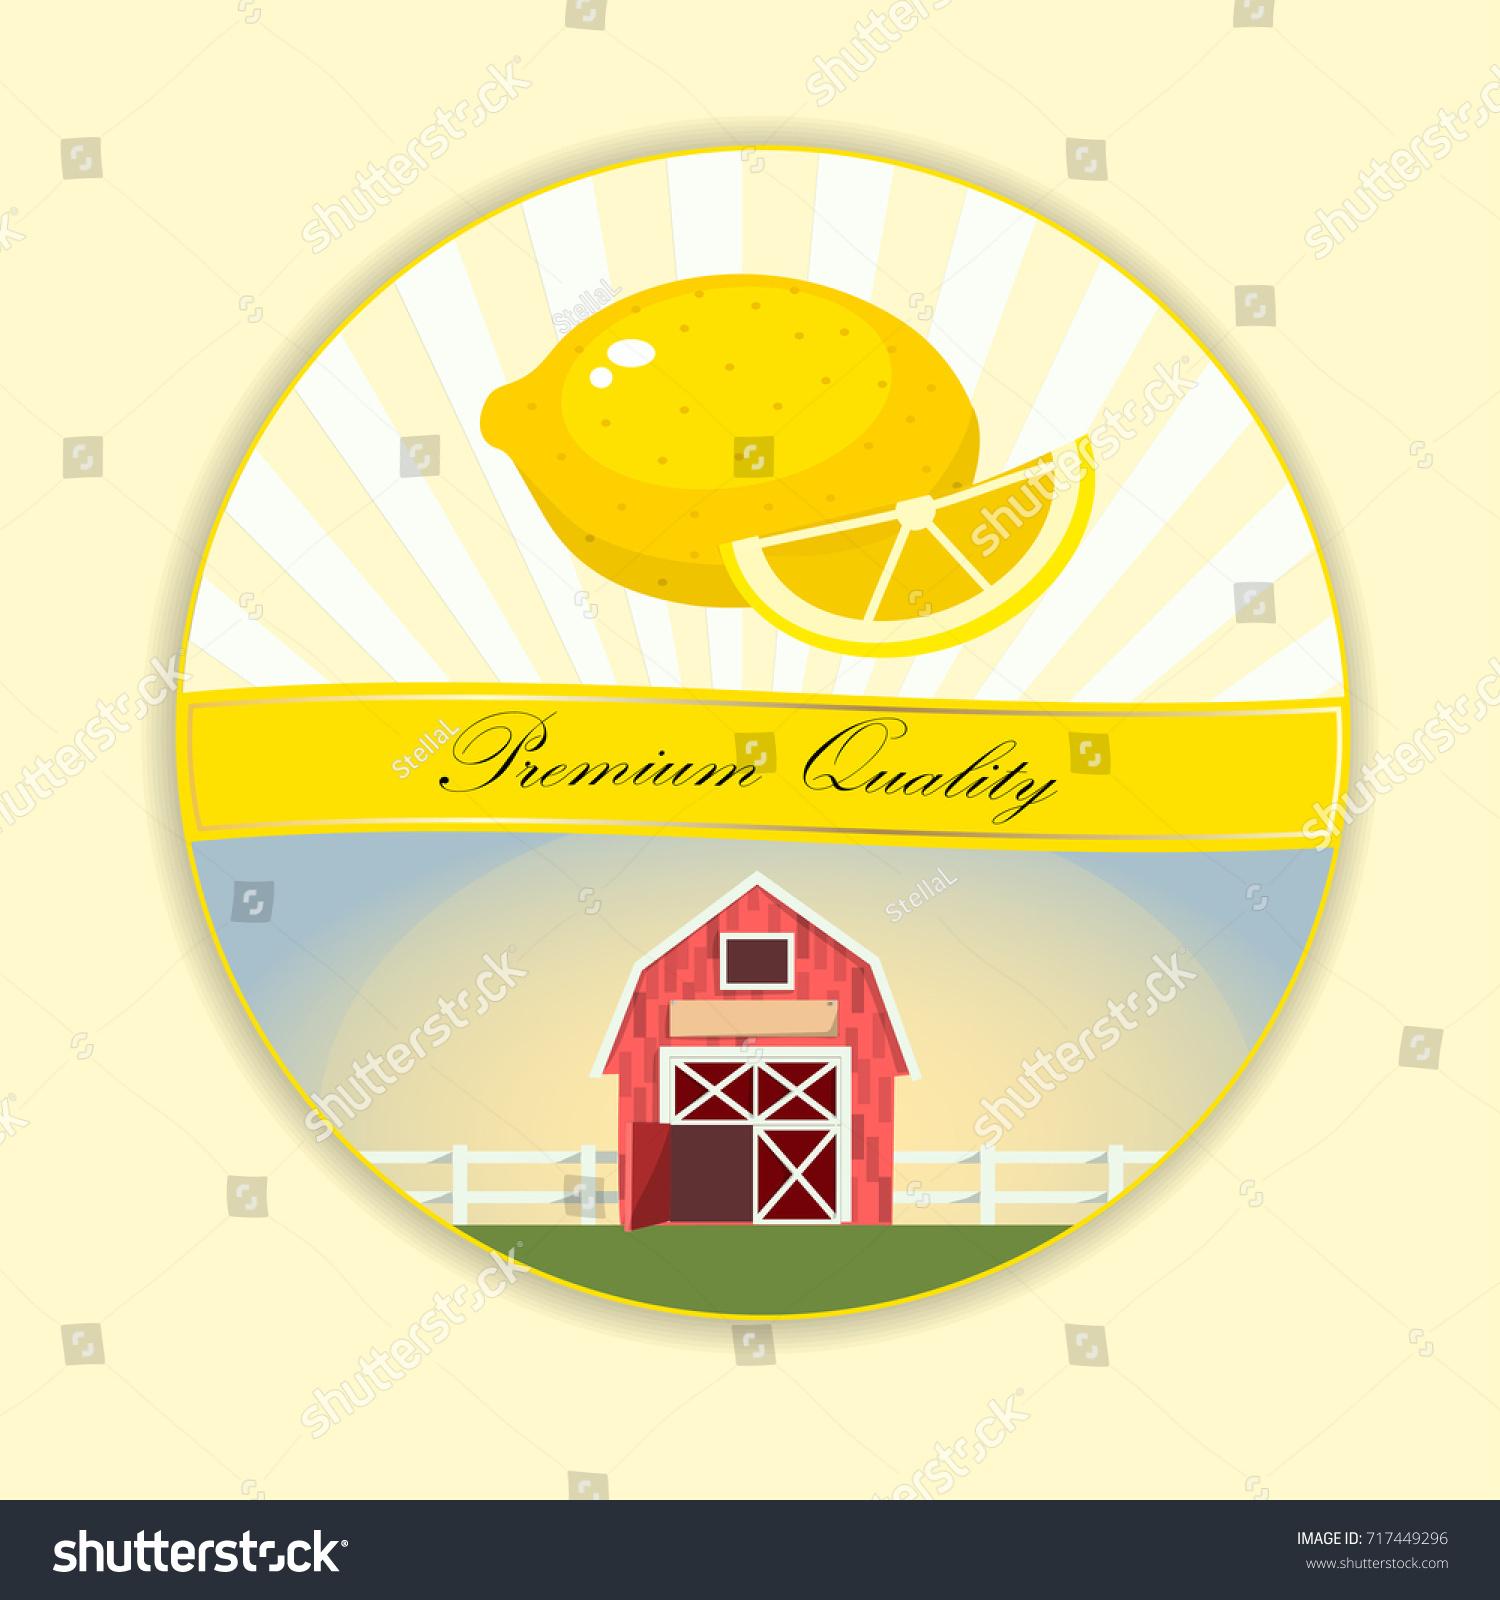 Sweet juicy whole slice lemon lime stock vector 717449296 shutterstock sweet juicy whole and slice lemon or lime fruit symbol for jam and juice product label buycottarizona Image collections